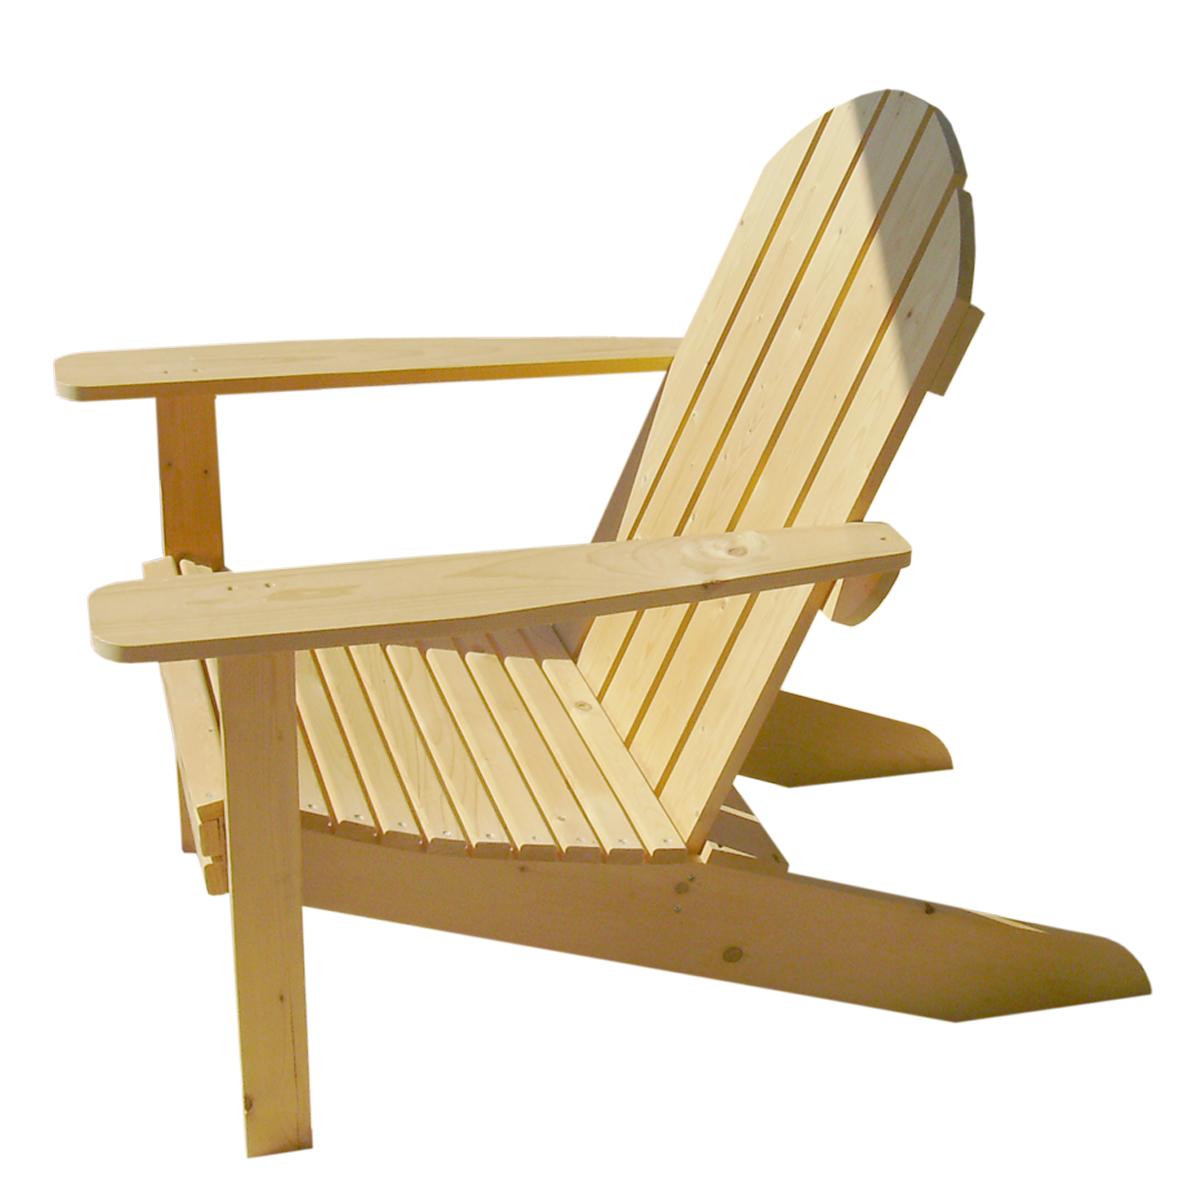 Woodwork by Pe: Muskoka chair